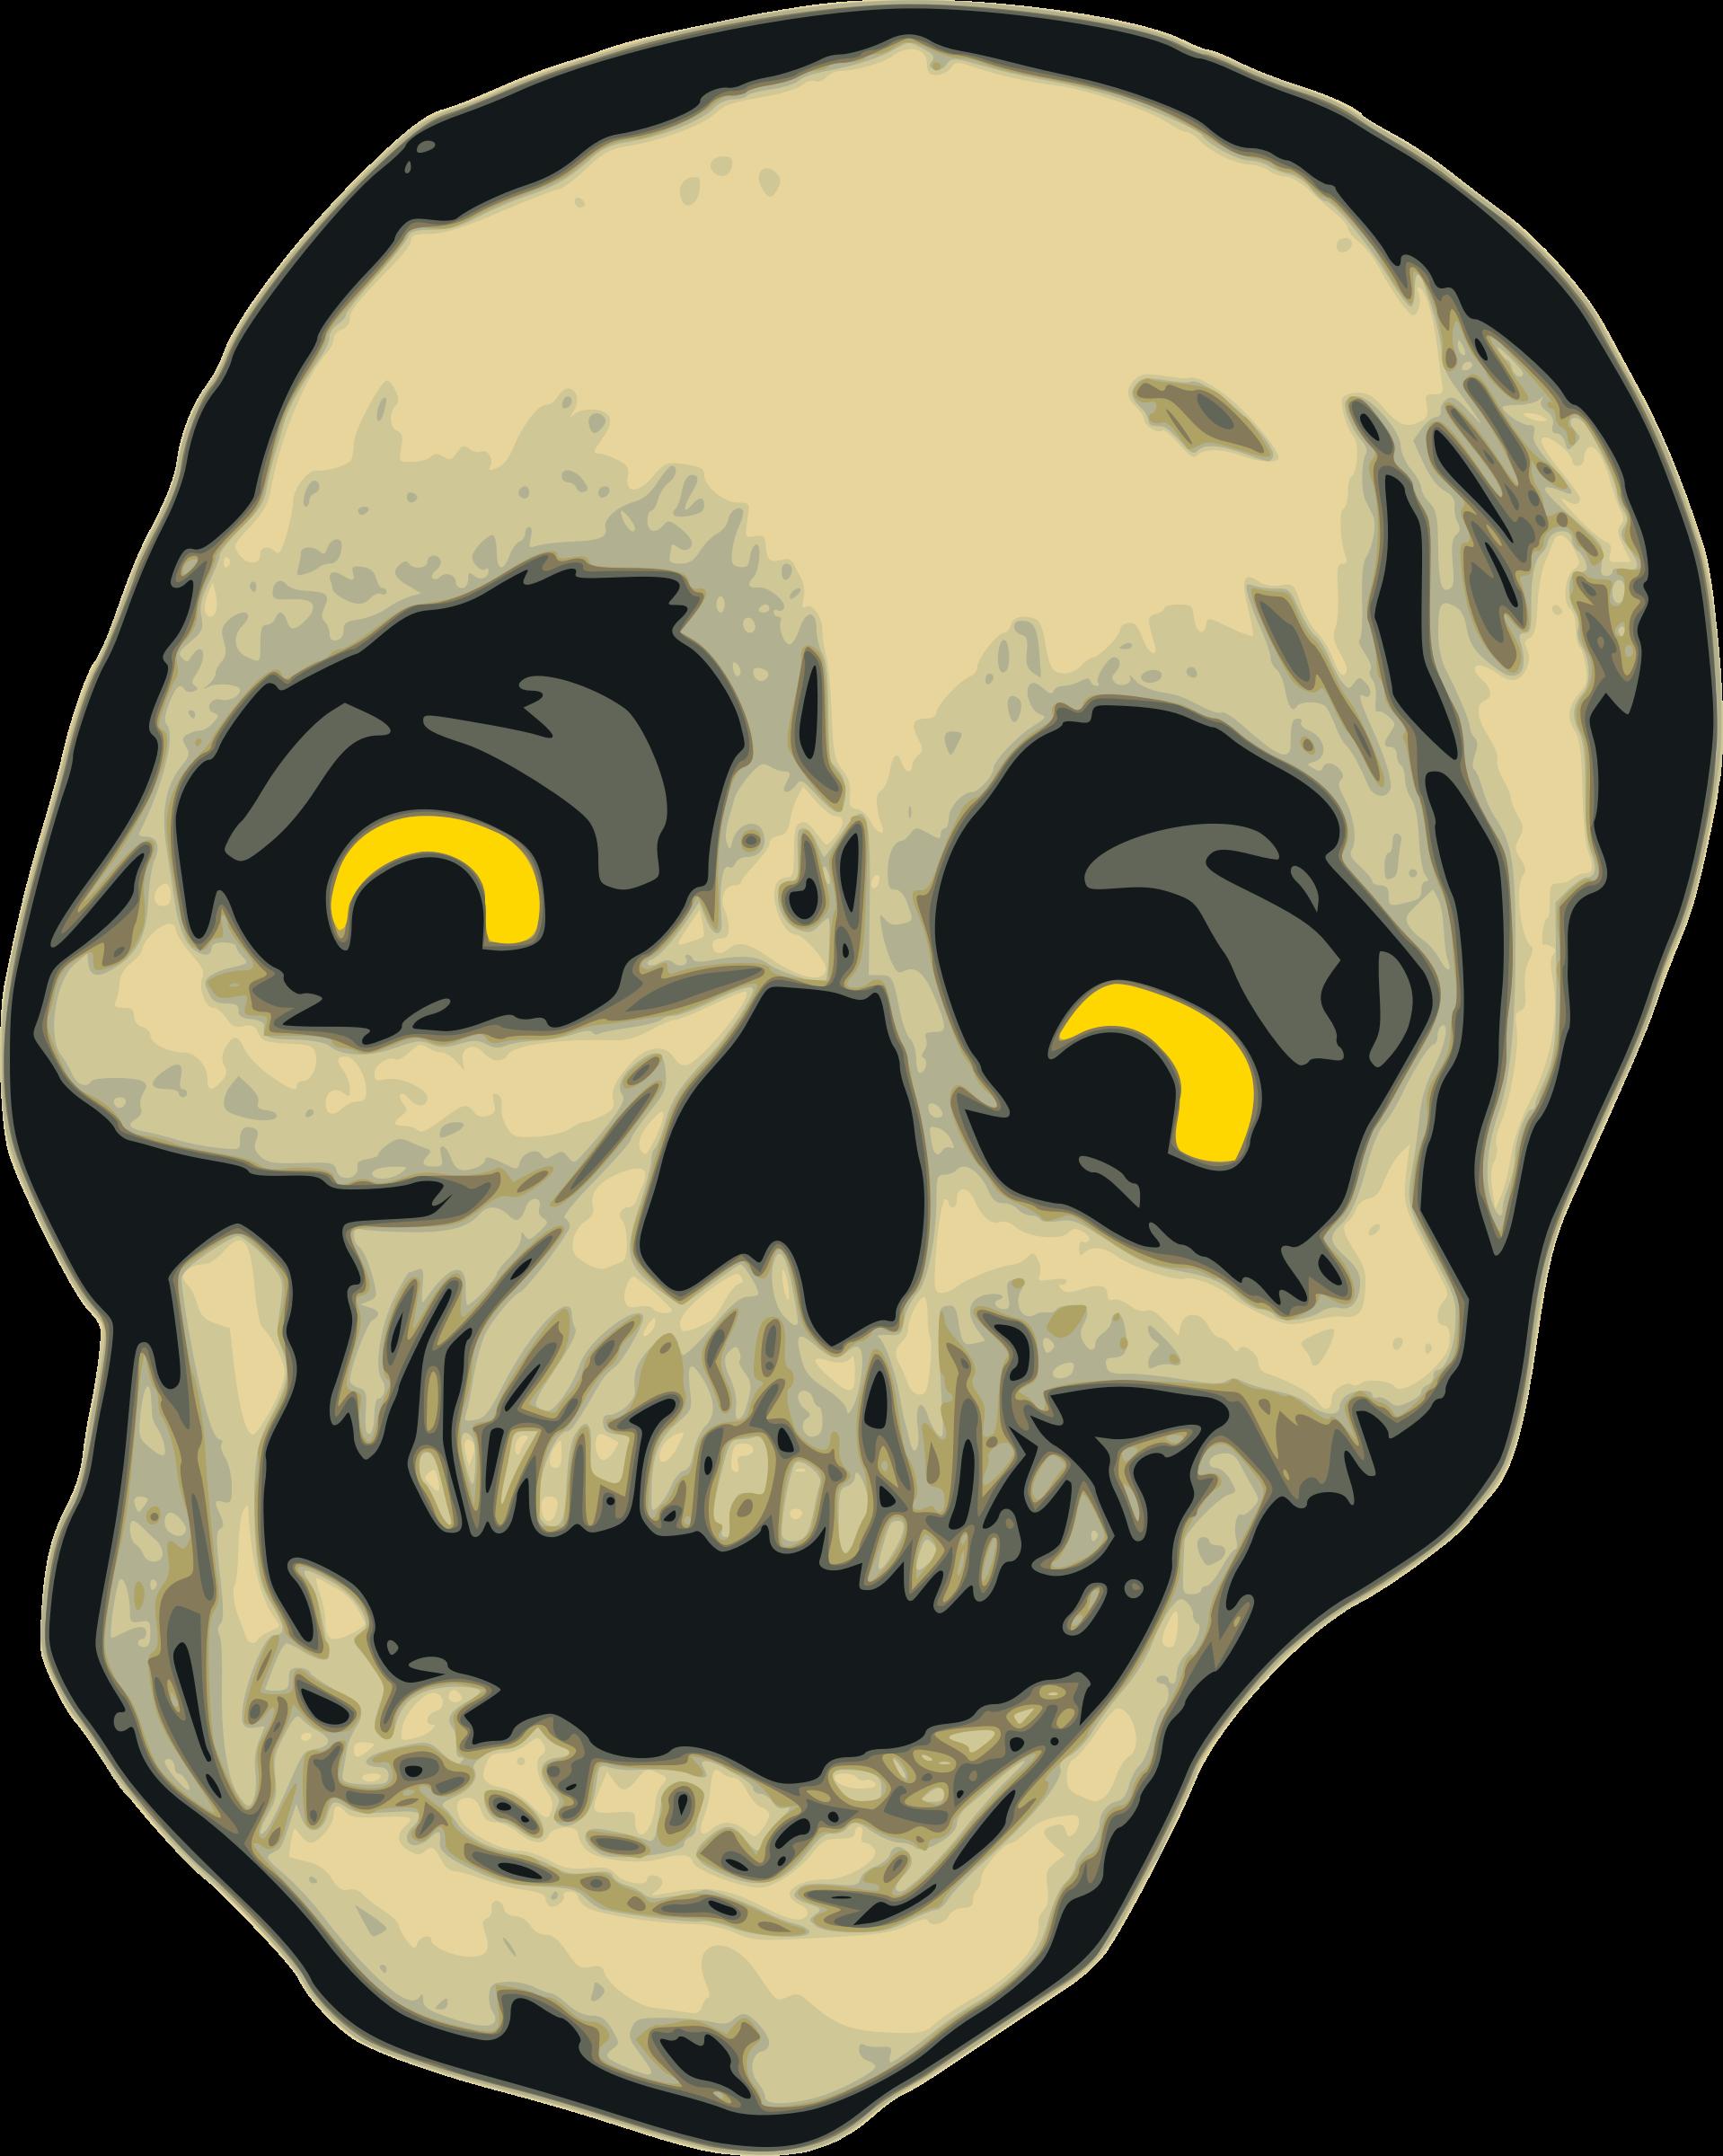 Cackling big image png. Clipart mouth skull